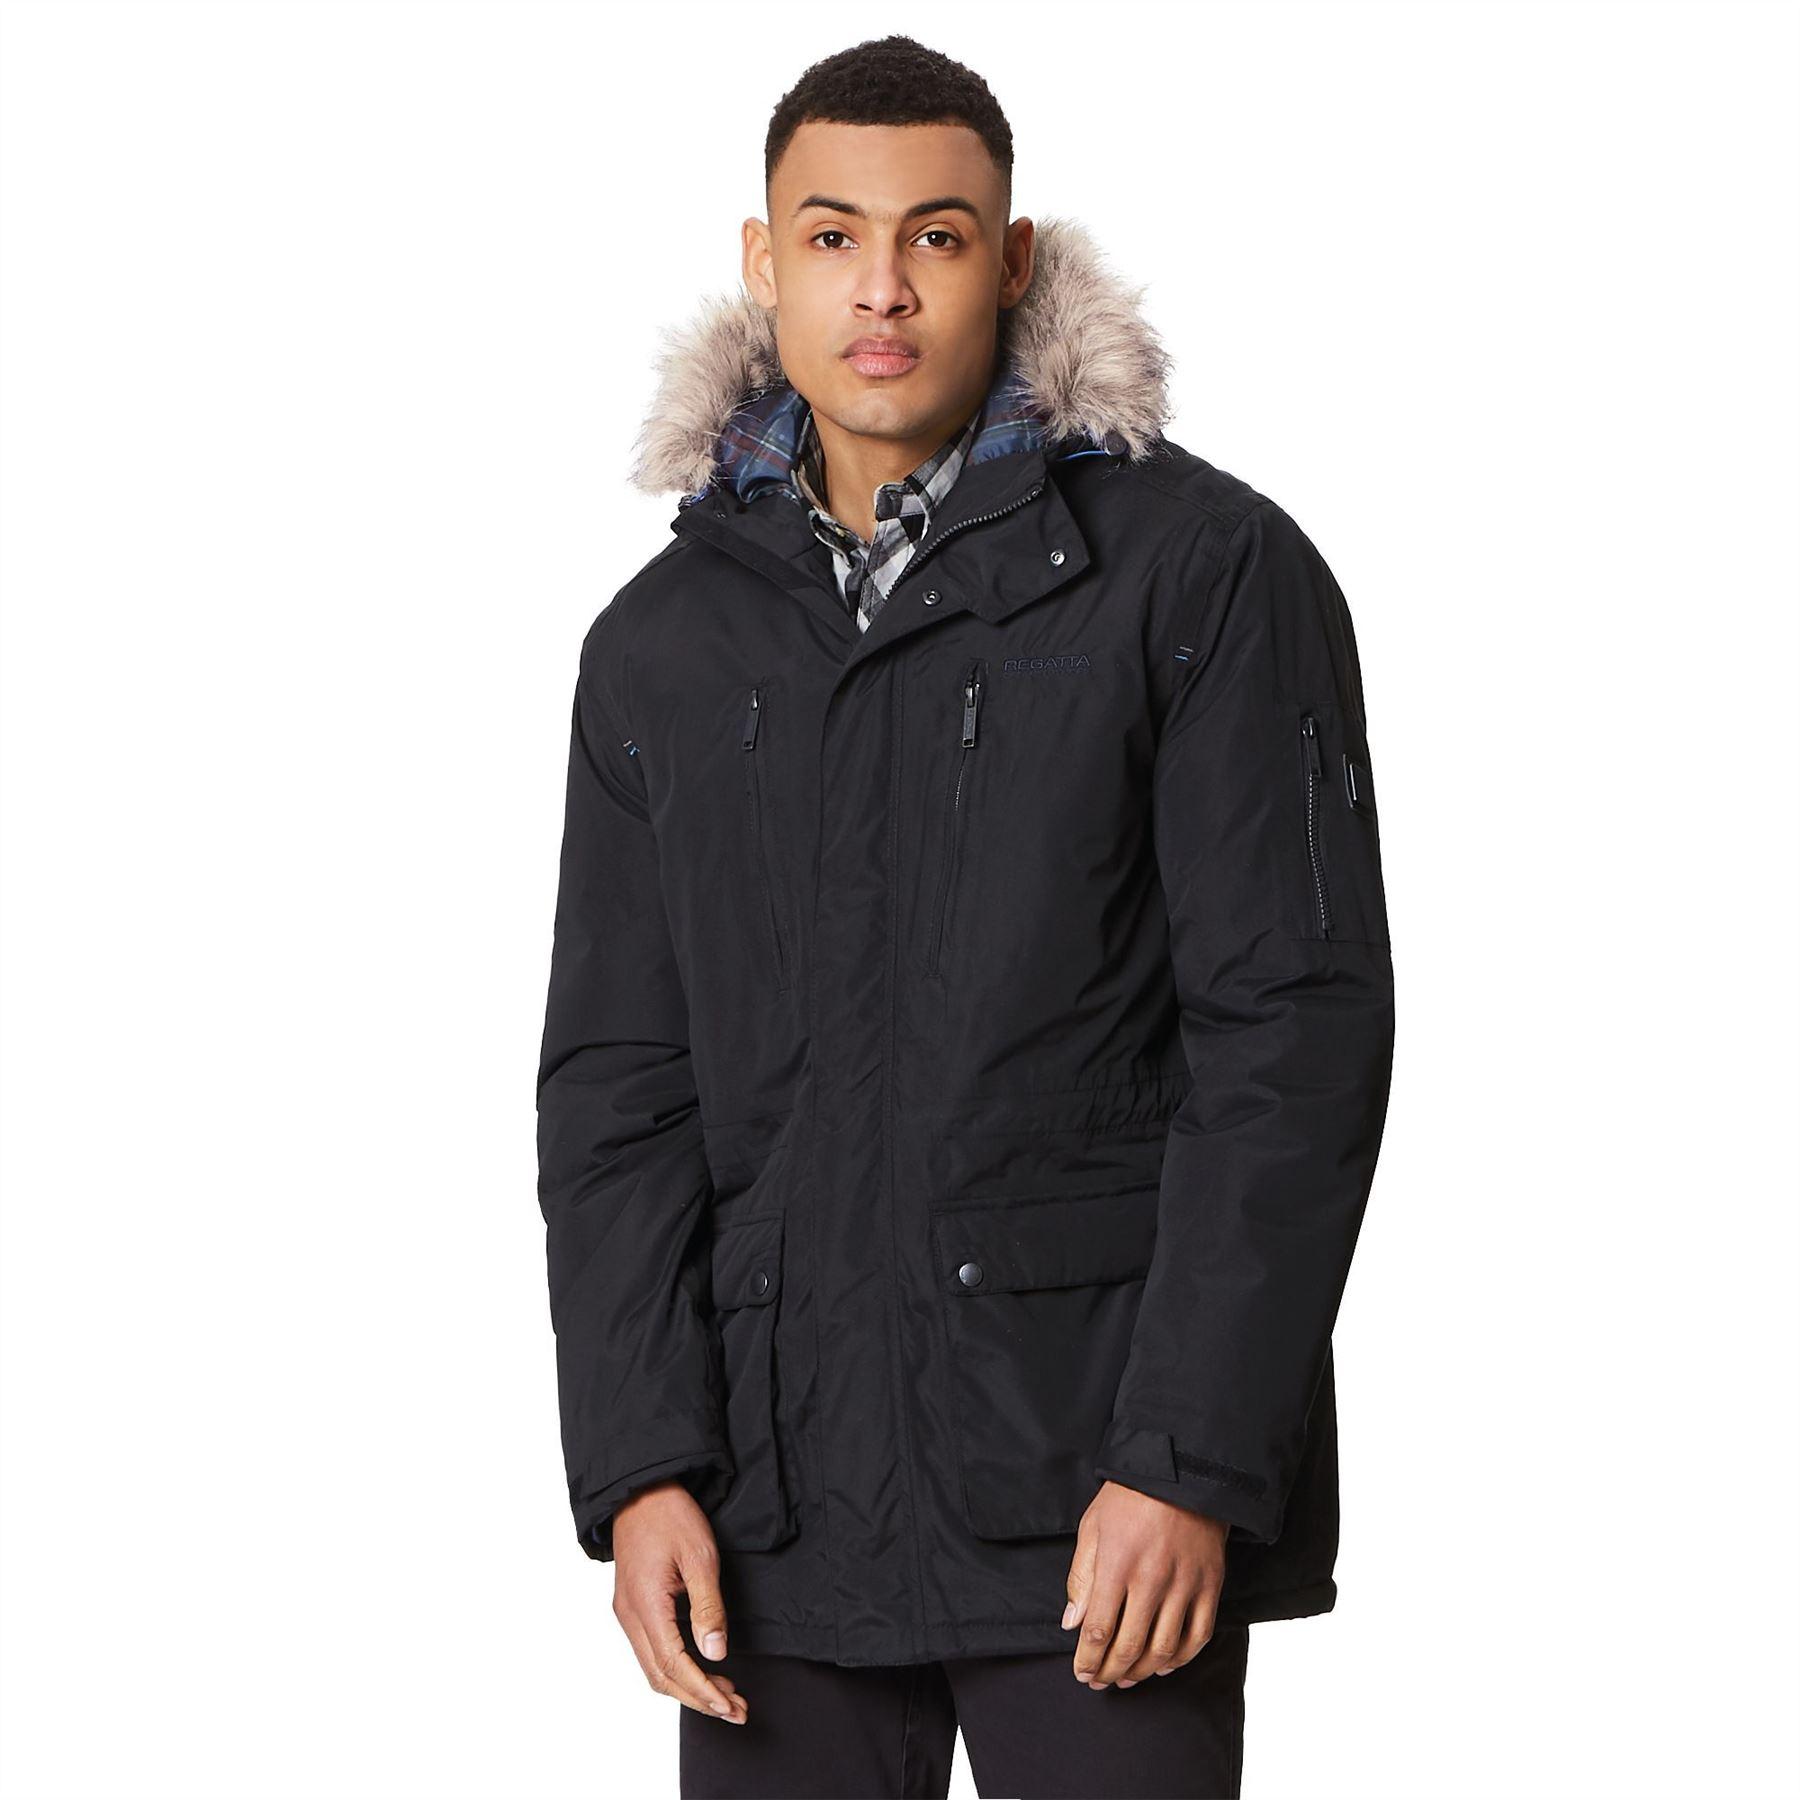 Regatta Salinger Mens Waterproof Parka Style Hooded Jacket Breathable